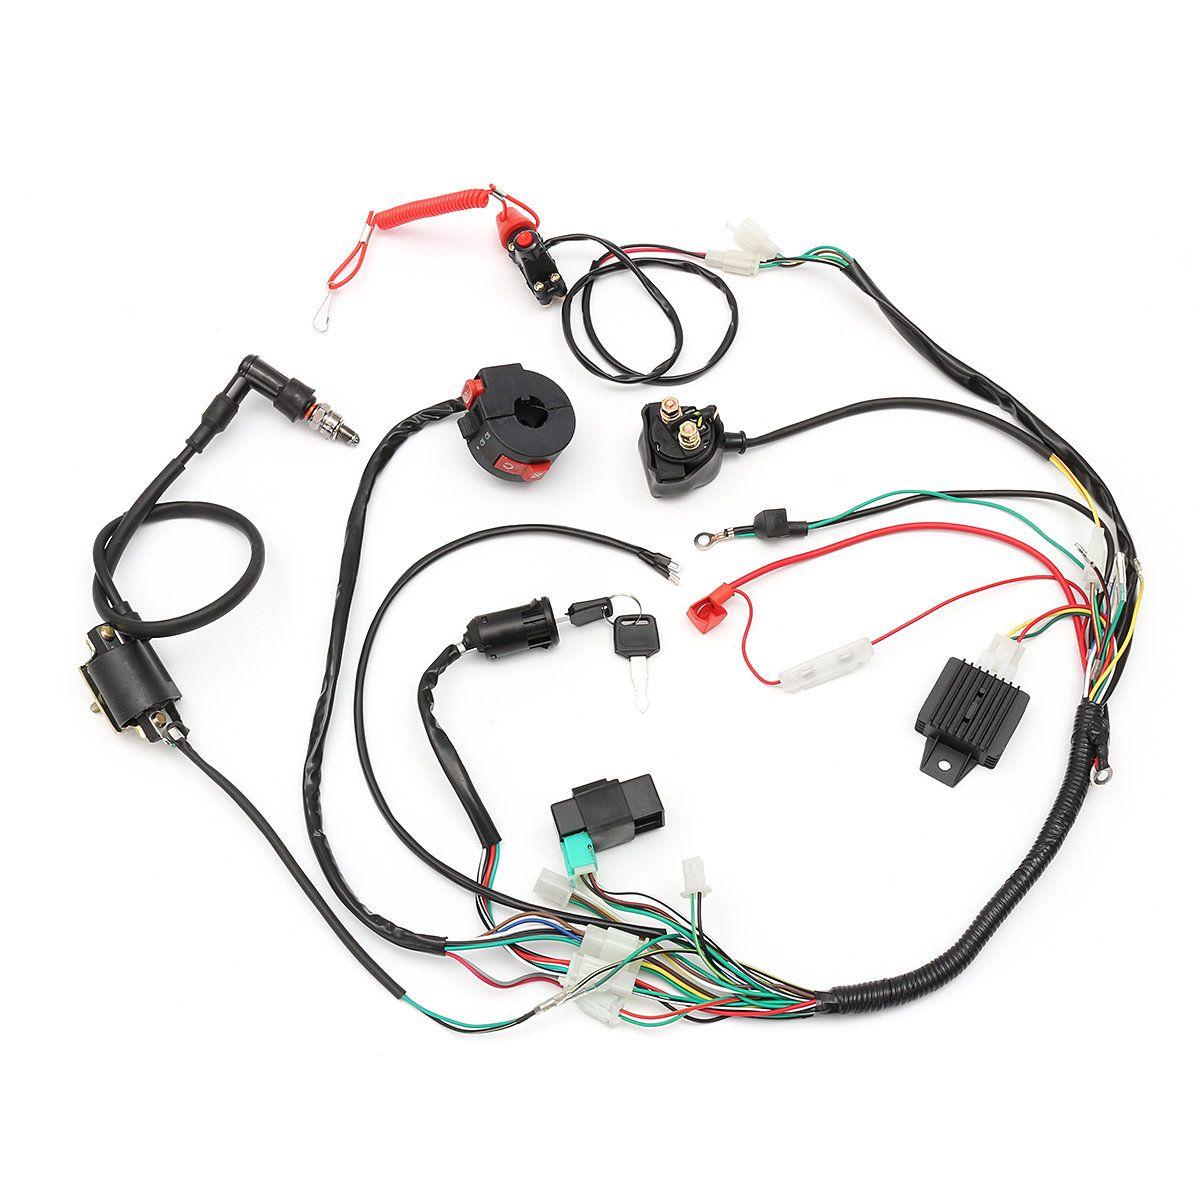 wiring harness loom solenoid coil rectifier cdi 50cc 70cc 110cc 5 pin cdi box wiring diagram kymco cdi box ac plug wiring harness